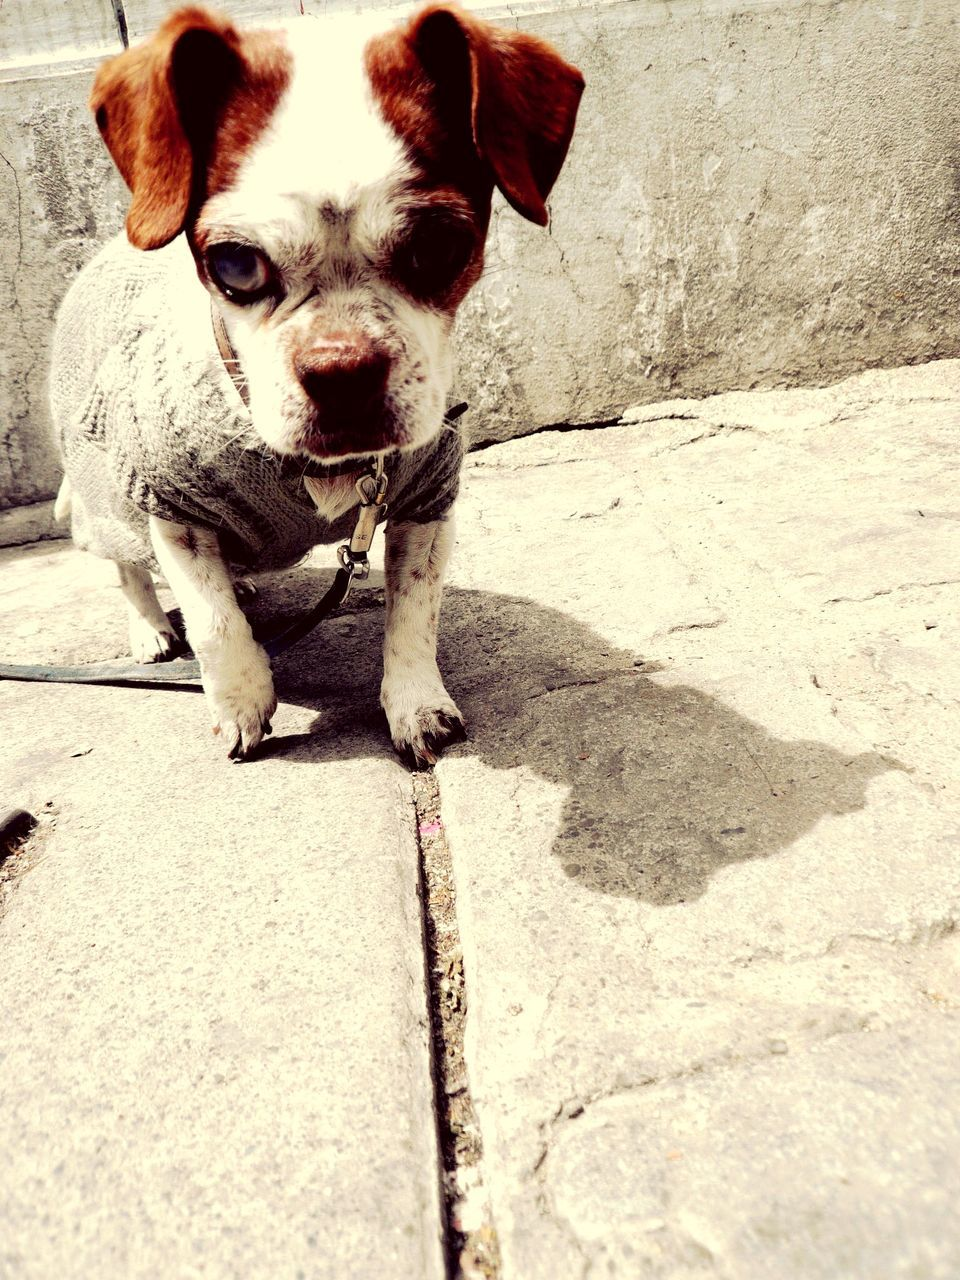 Portrait Of Dog Standing On Street